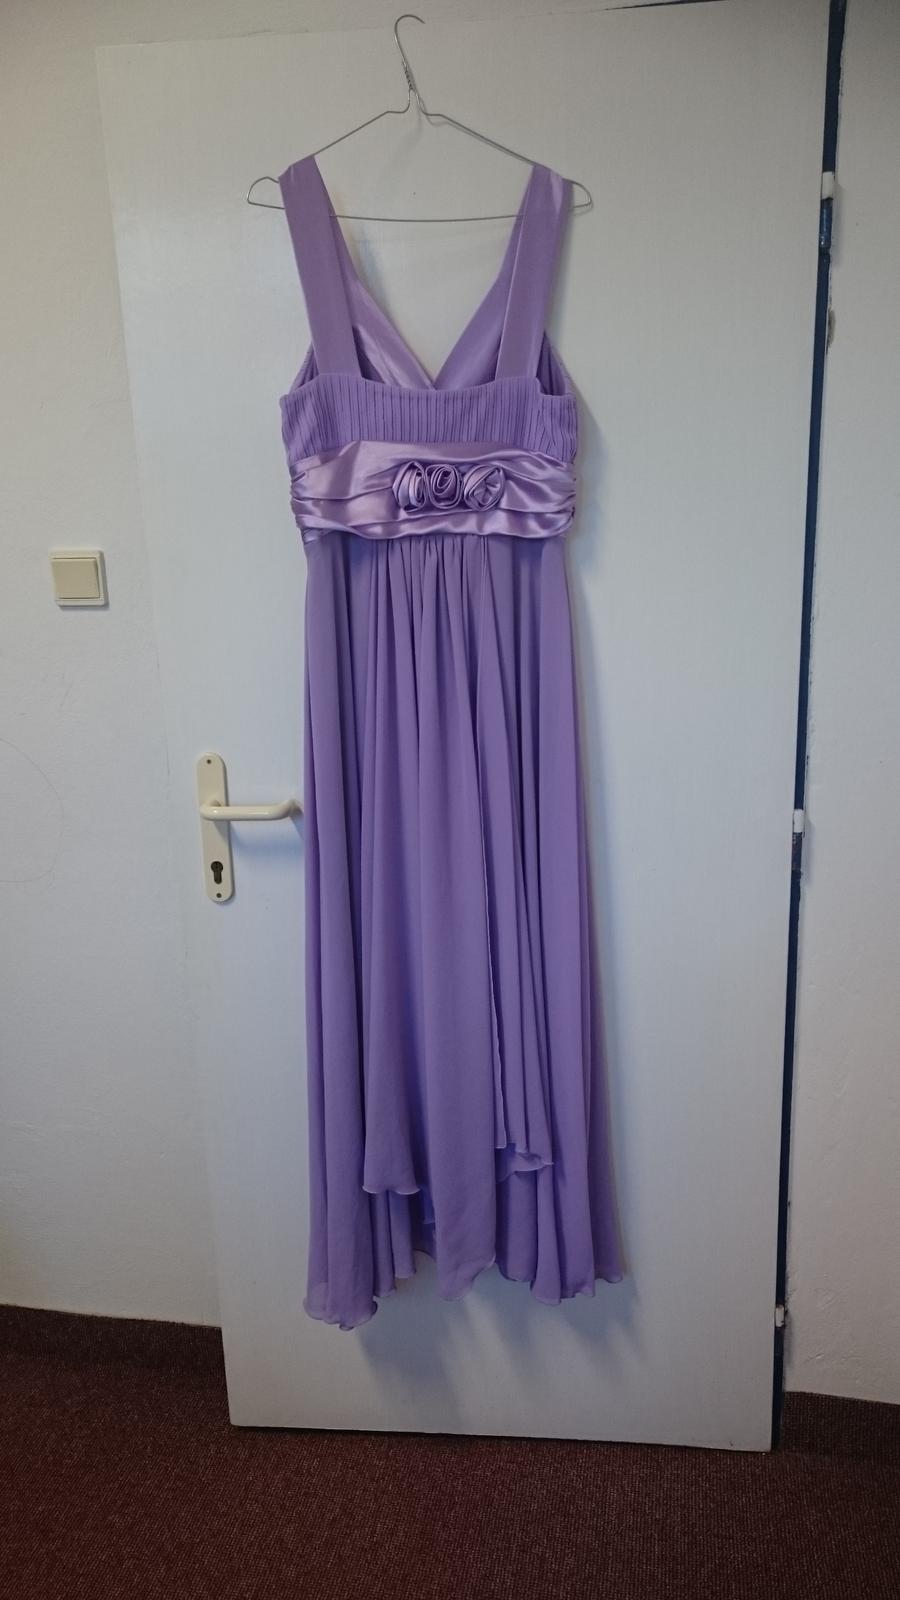 Fialové spoločenské šaty - Obrázok č. 2